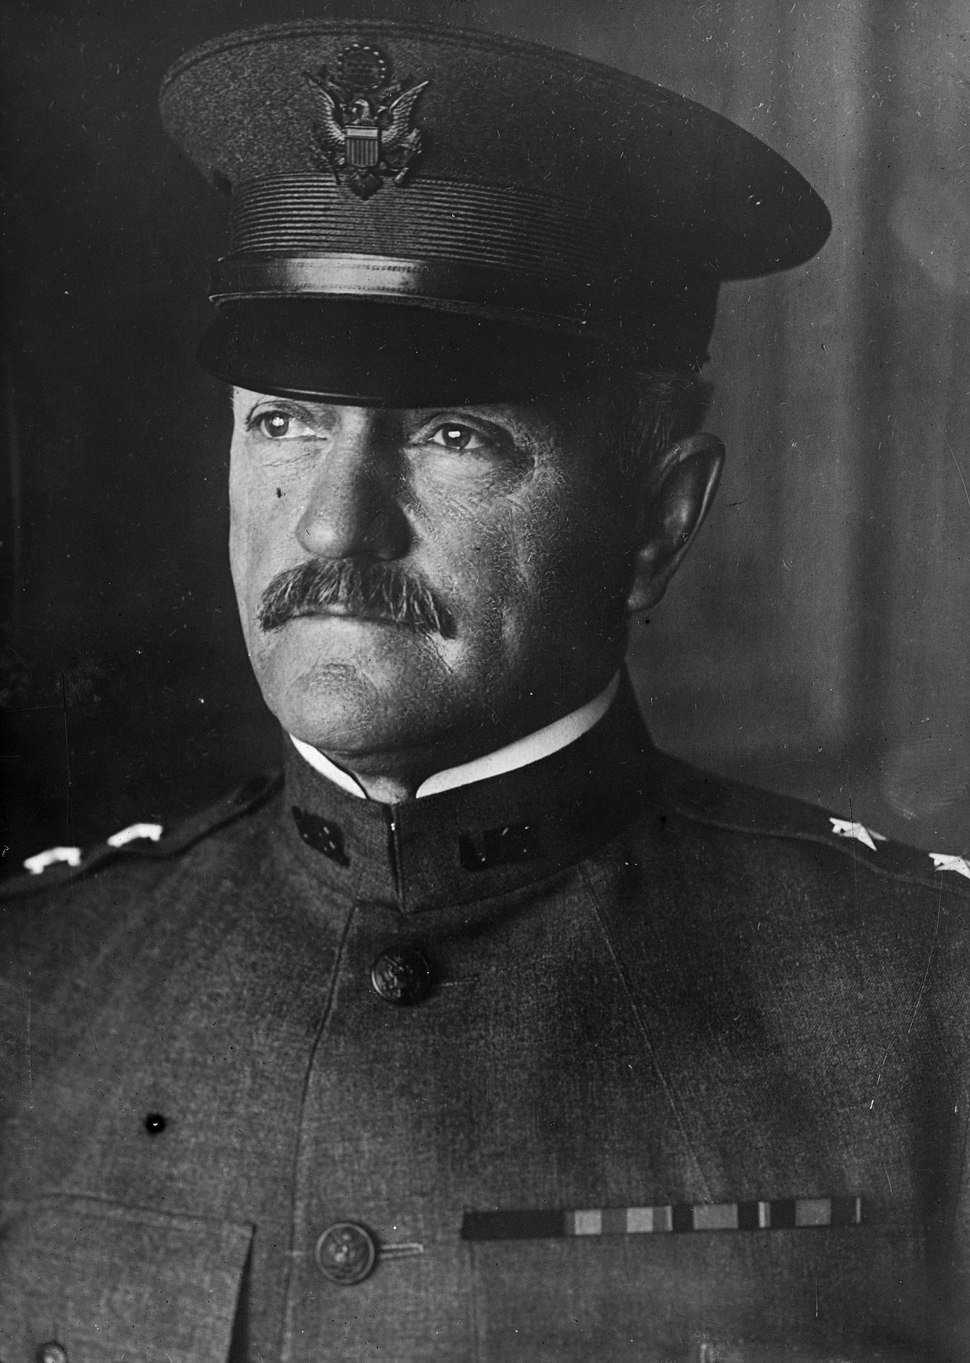 John Pershing, Bain bw photo as major general, 1917